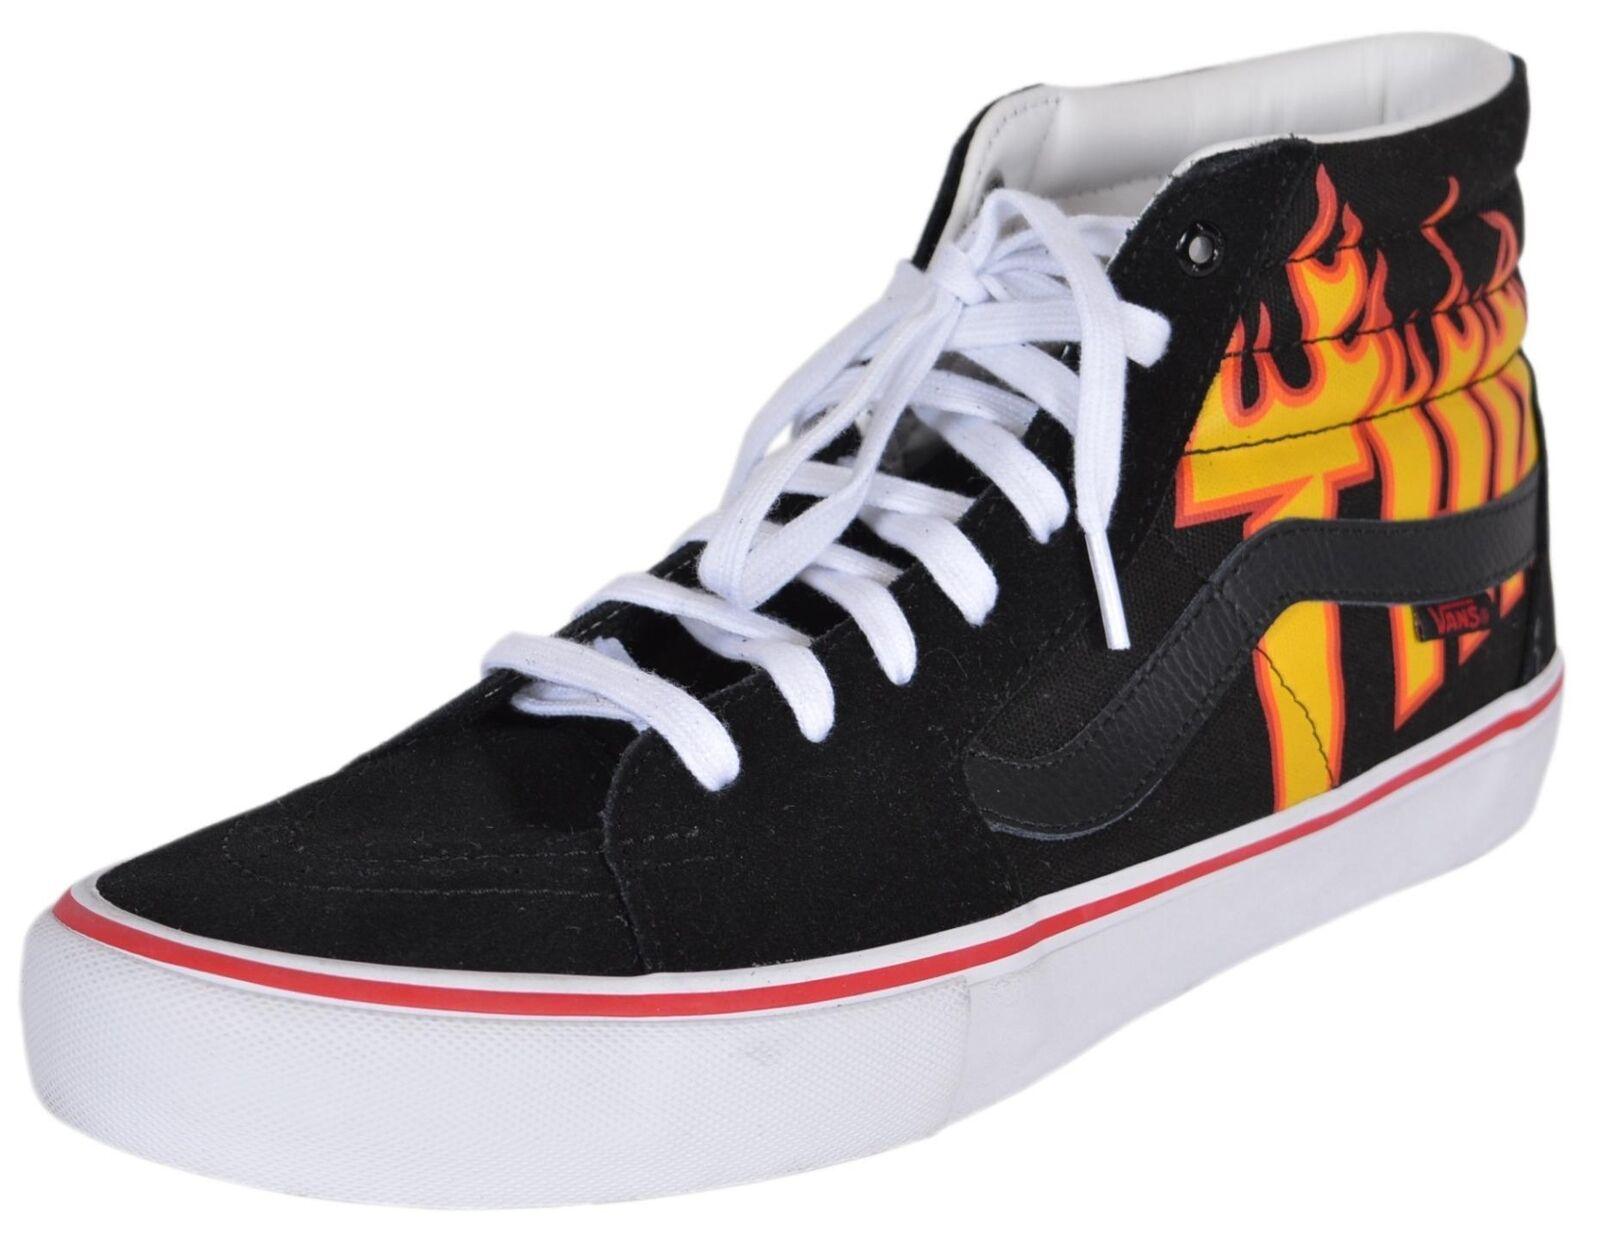 NIB VANS Men's SK8-Hi Thrasher Black Flame High Tops Skate Shoes Sneakers